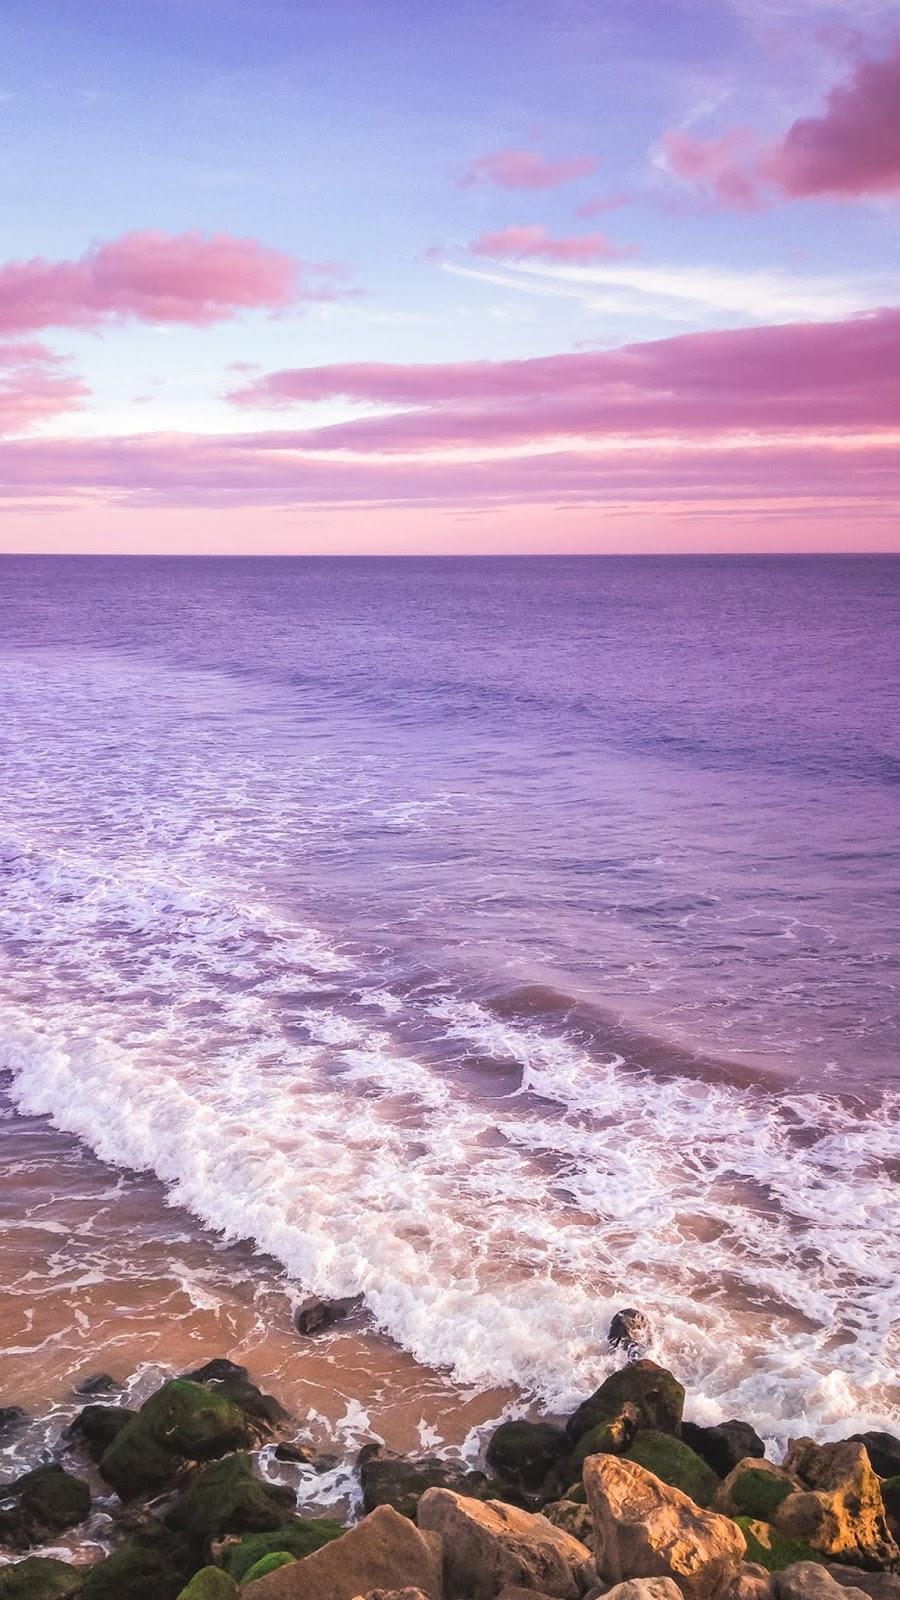 Twilight sky in the beach